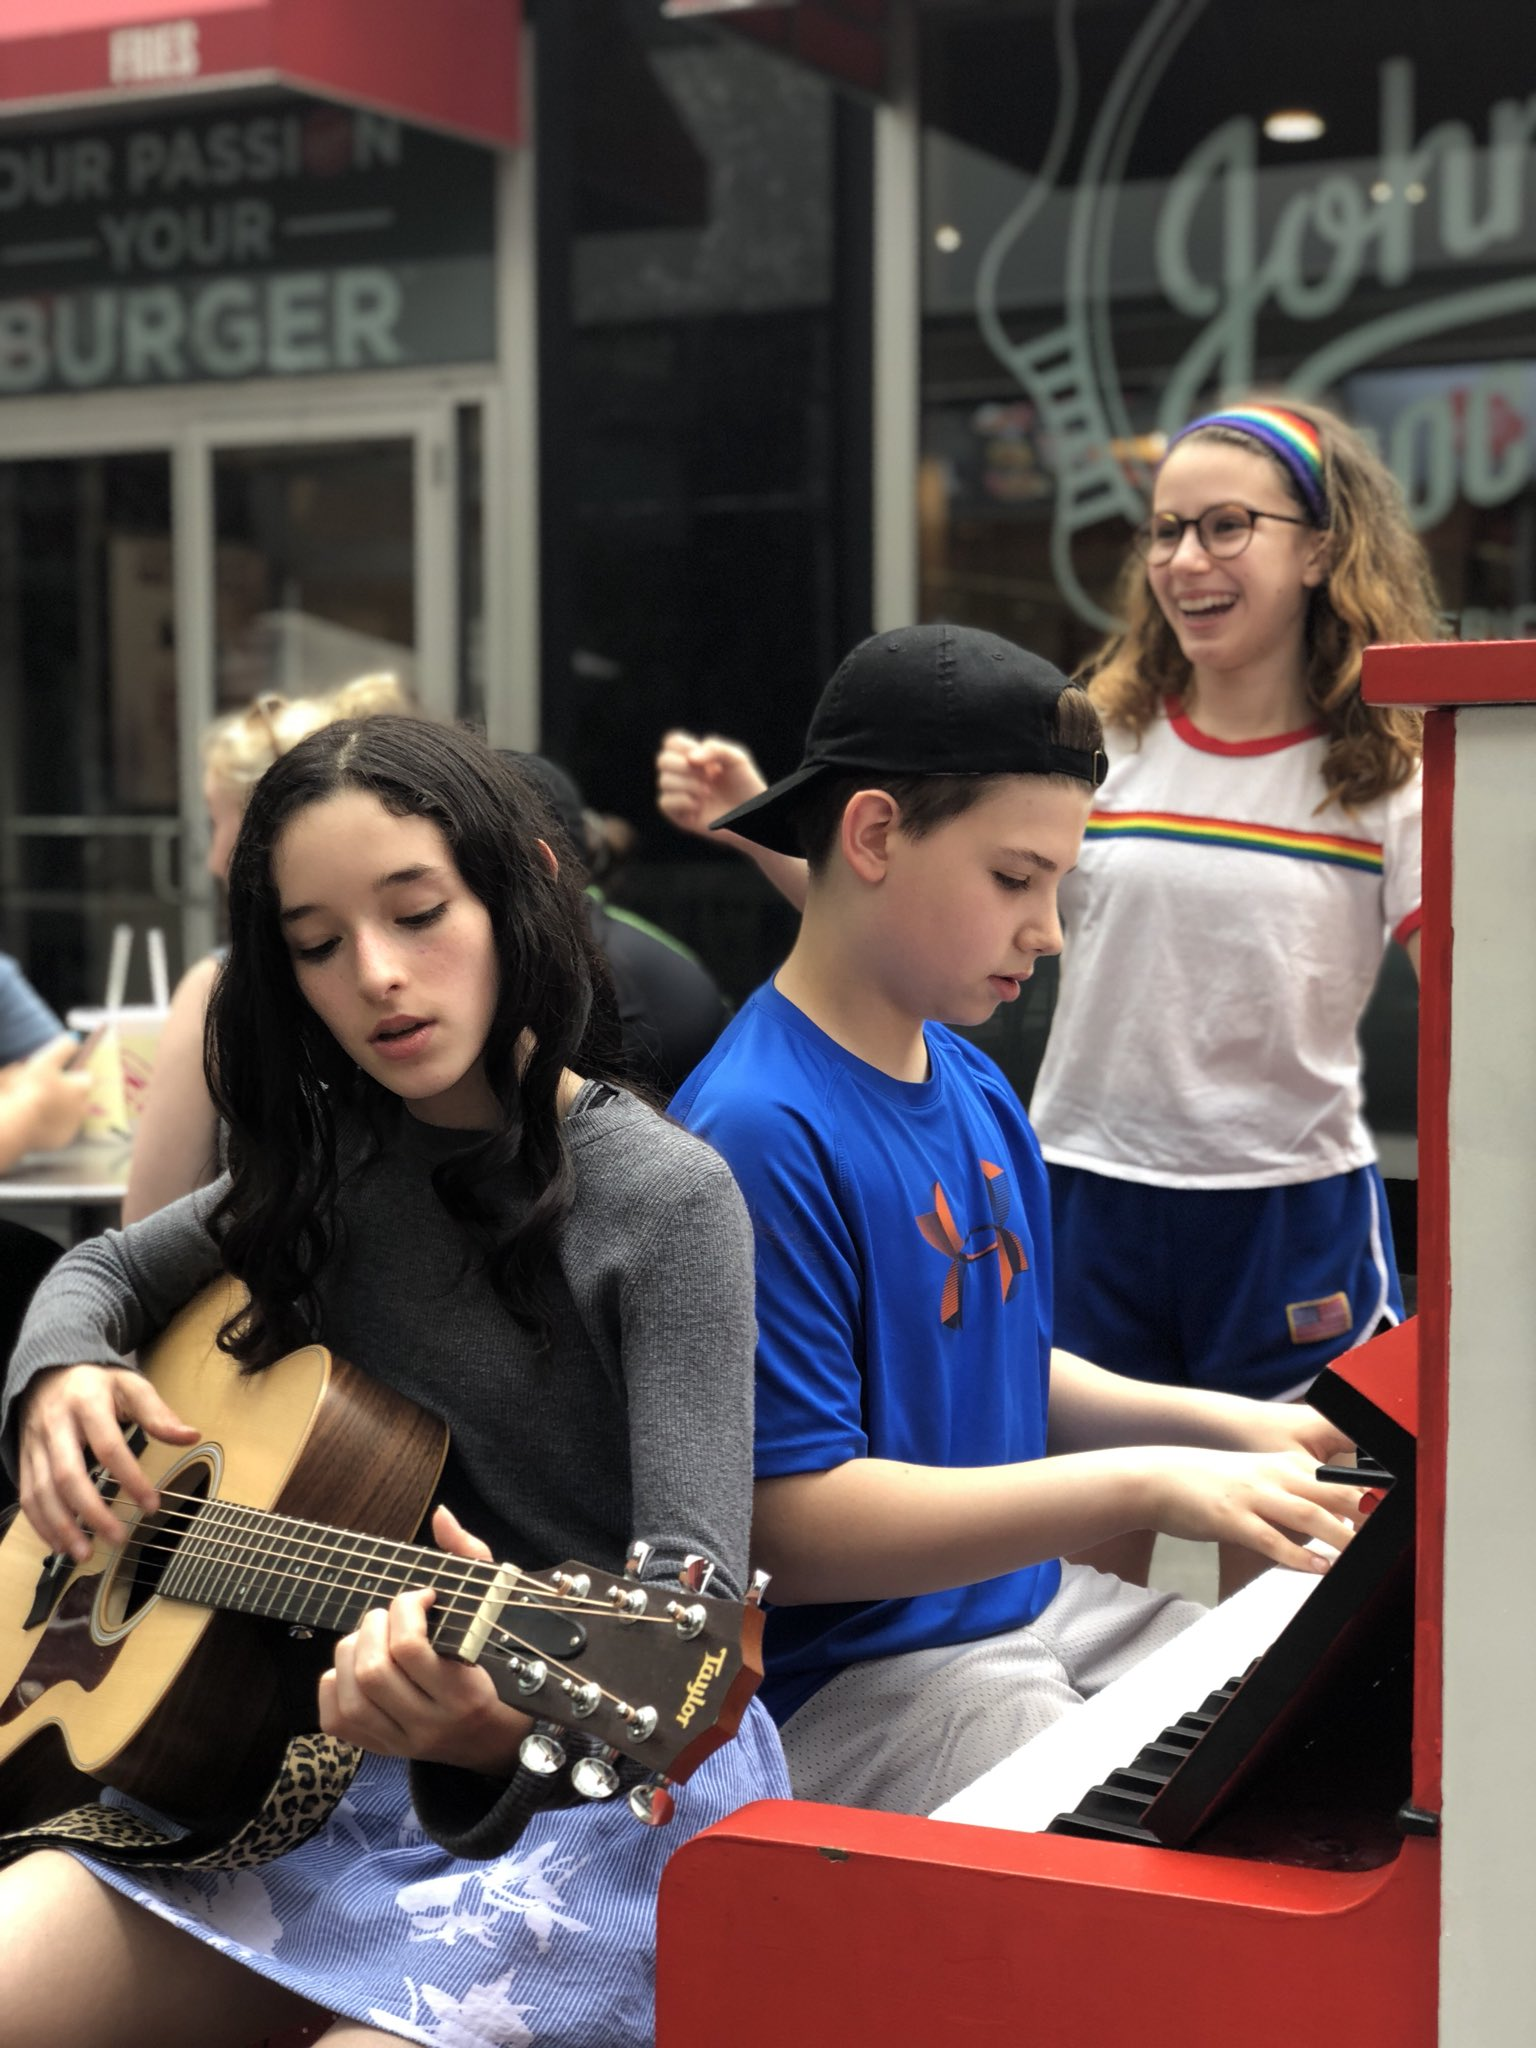 7b33e491b926 Broadway Kids Jam on Twitter: